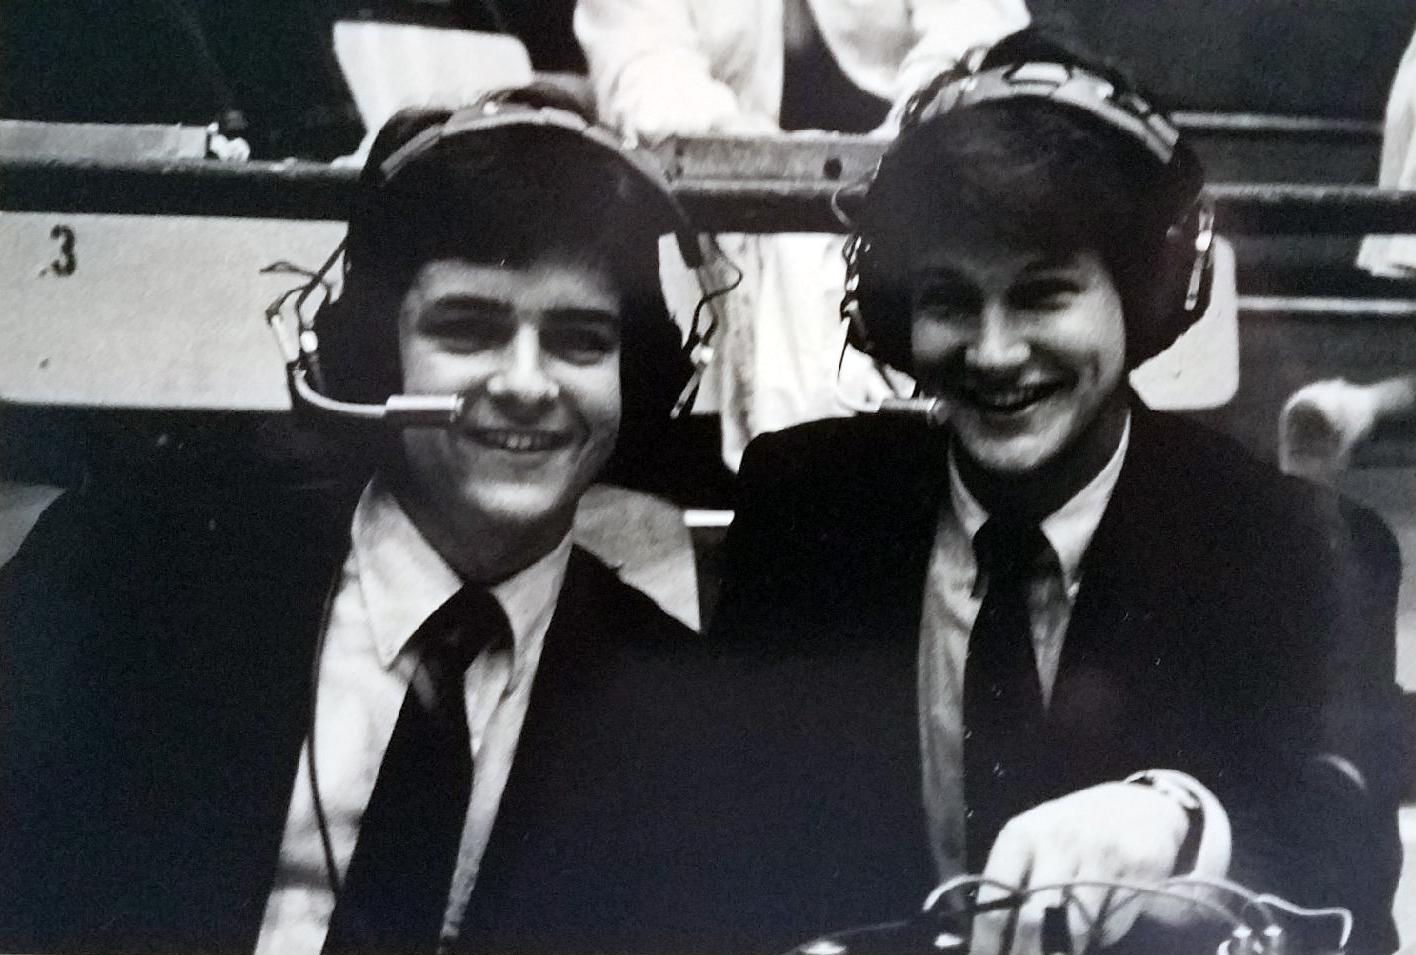 Young Pepperdine Sportscasters (Circa 1989-1990)